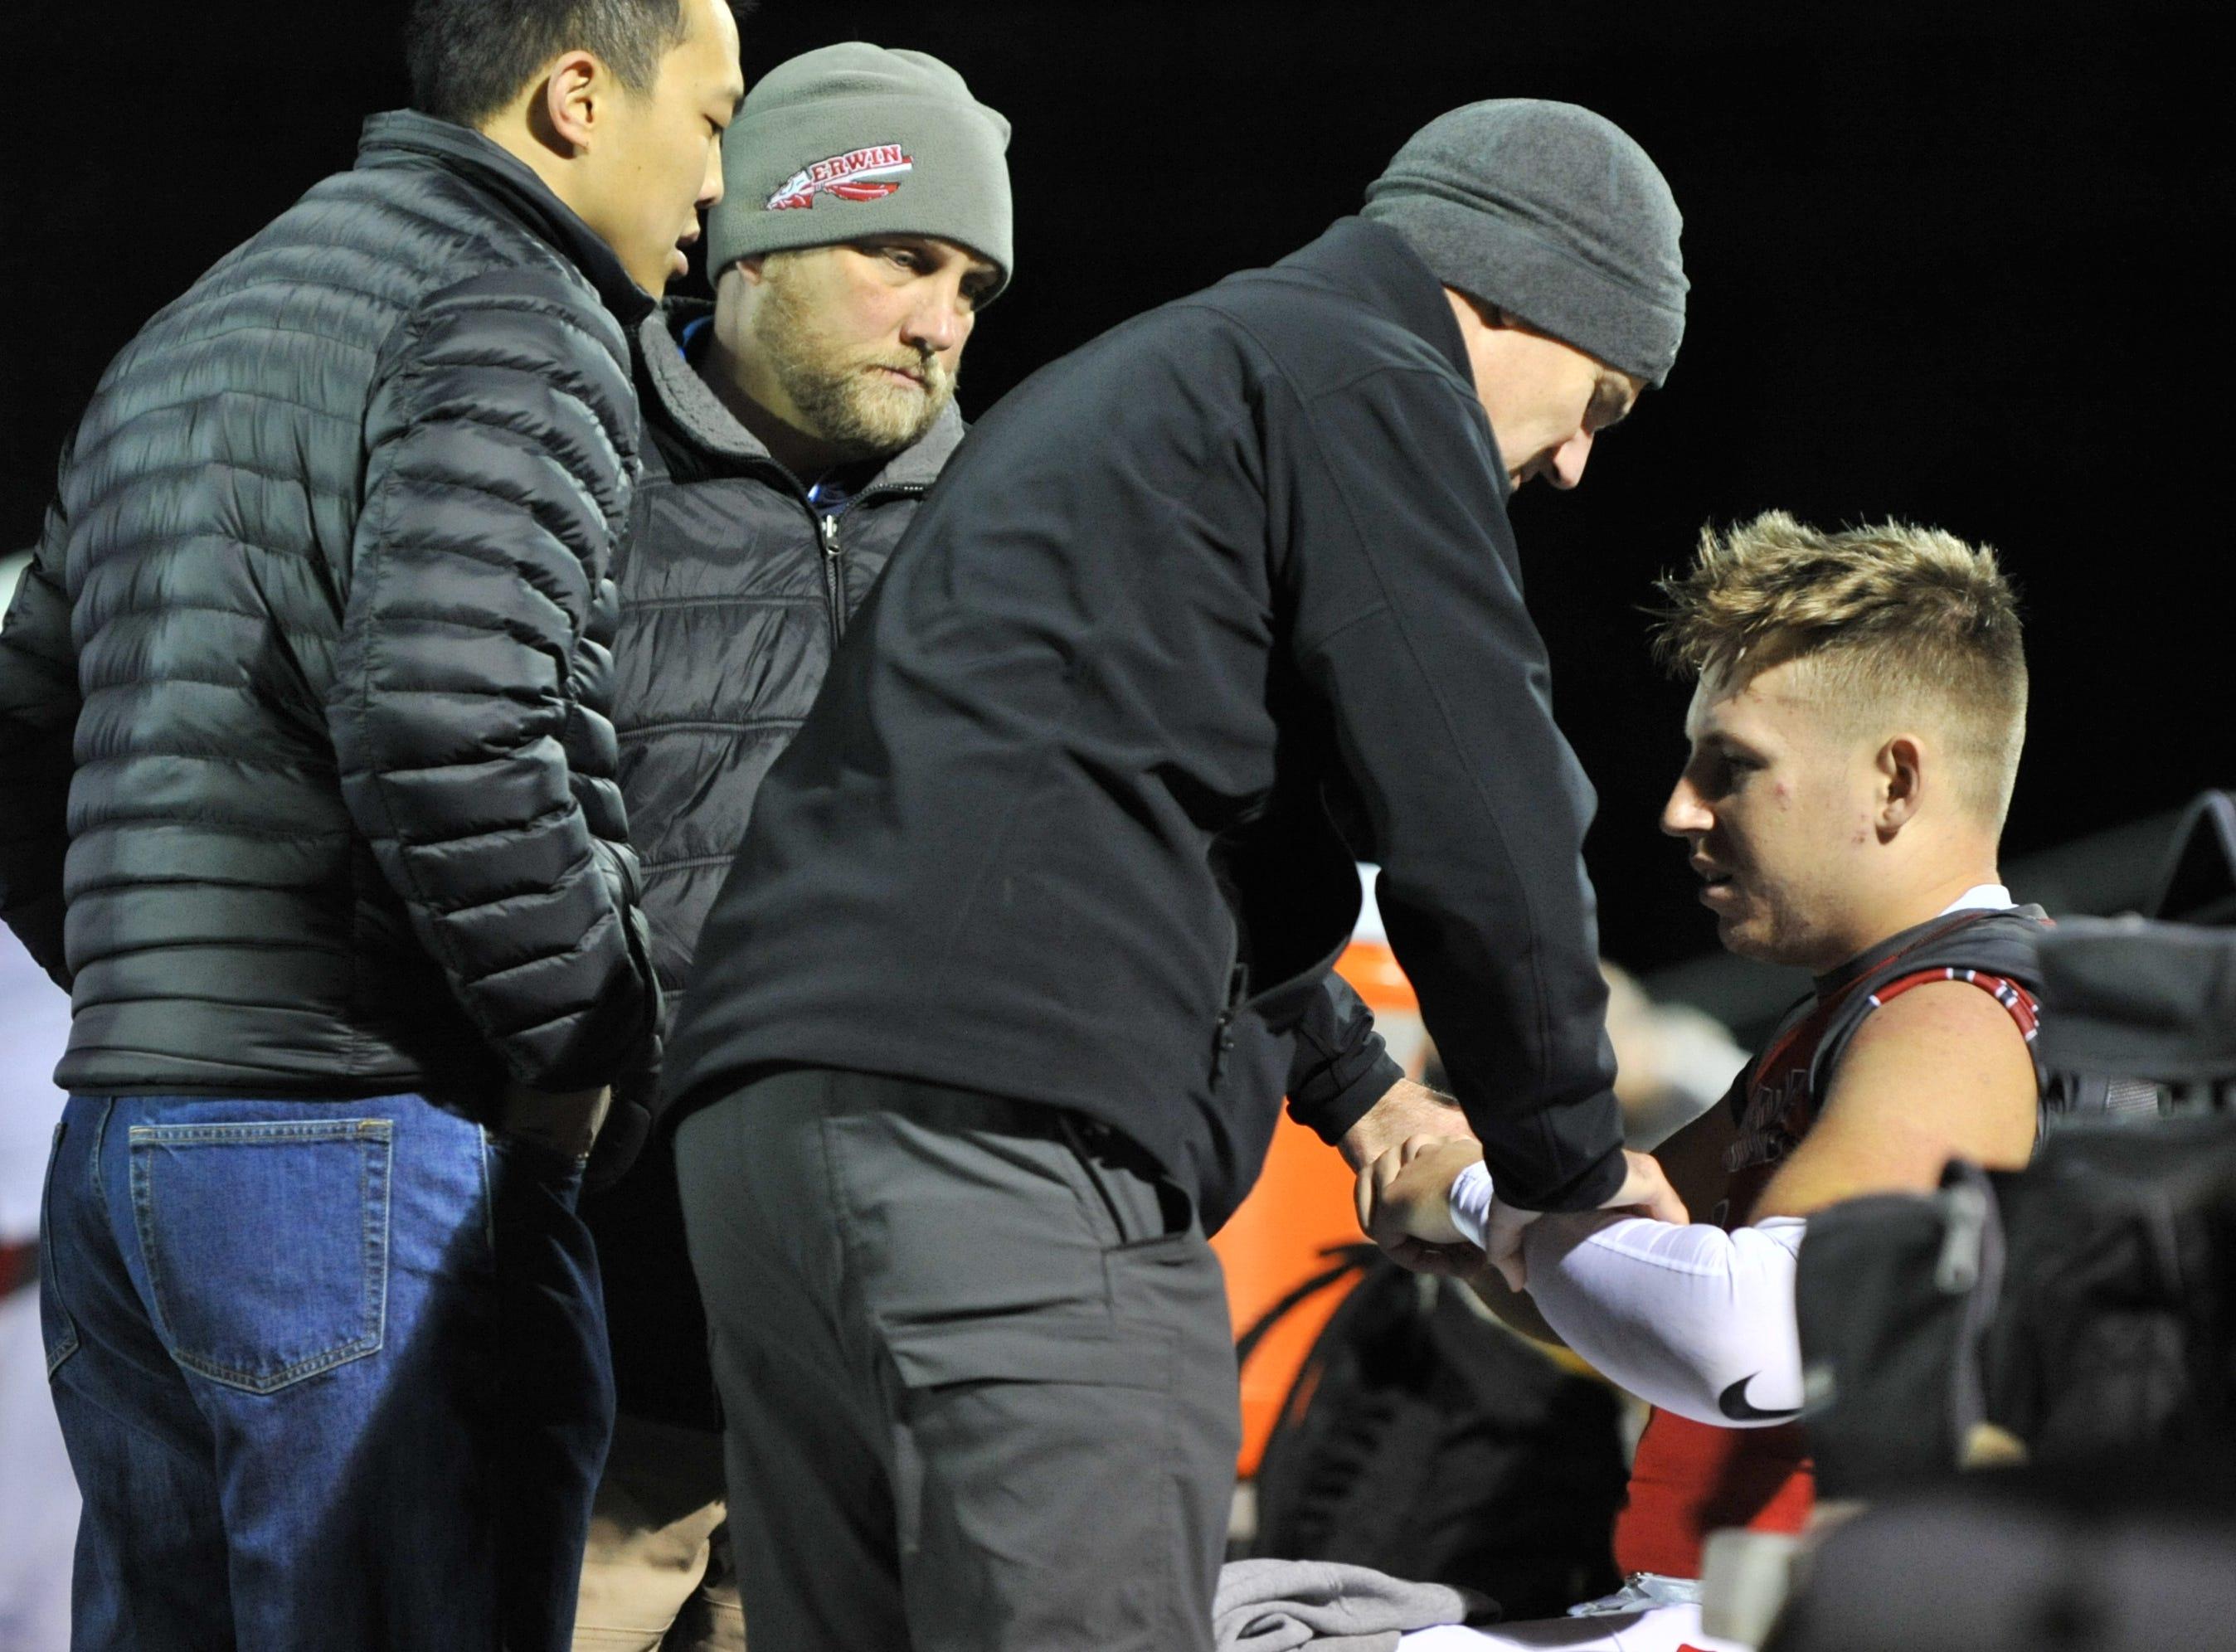 Scenes from Erwin's 43-0 win over Tuscola on Nov. 2, 2018.